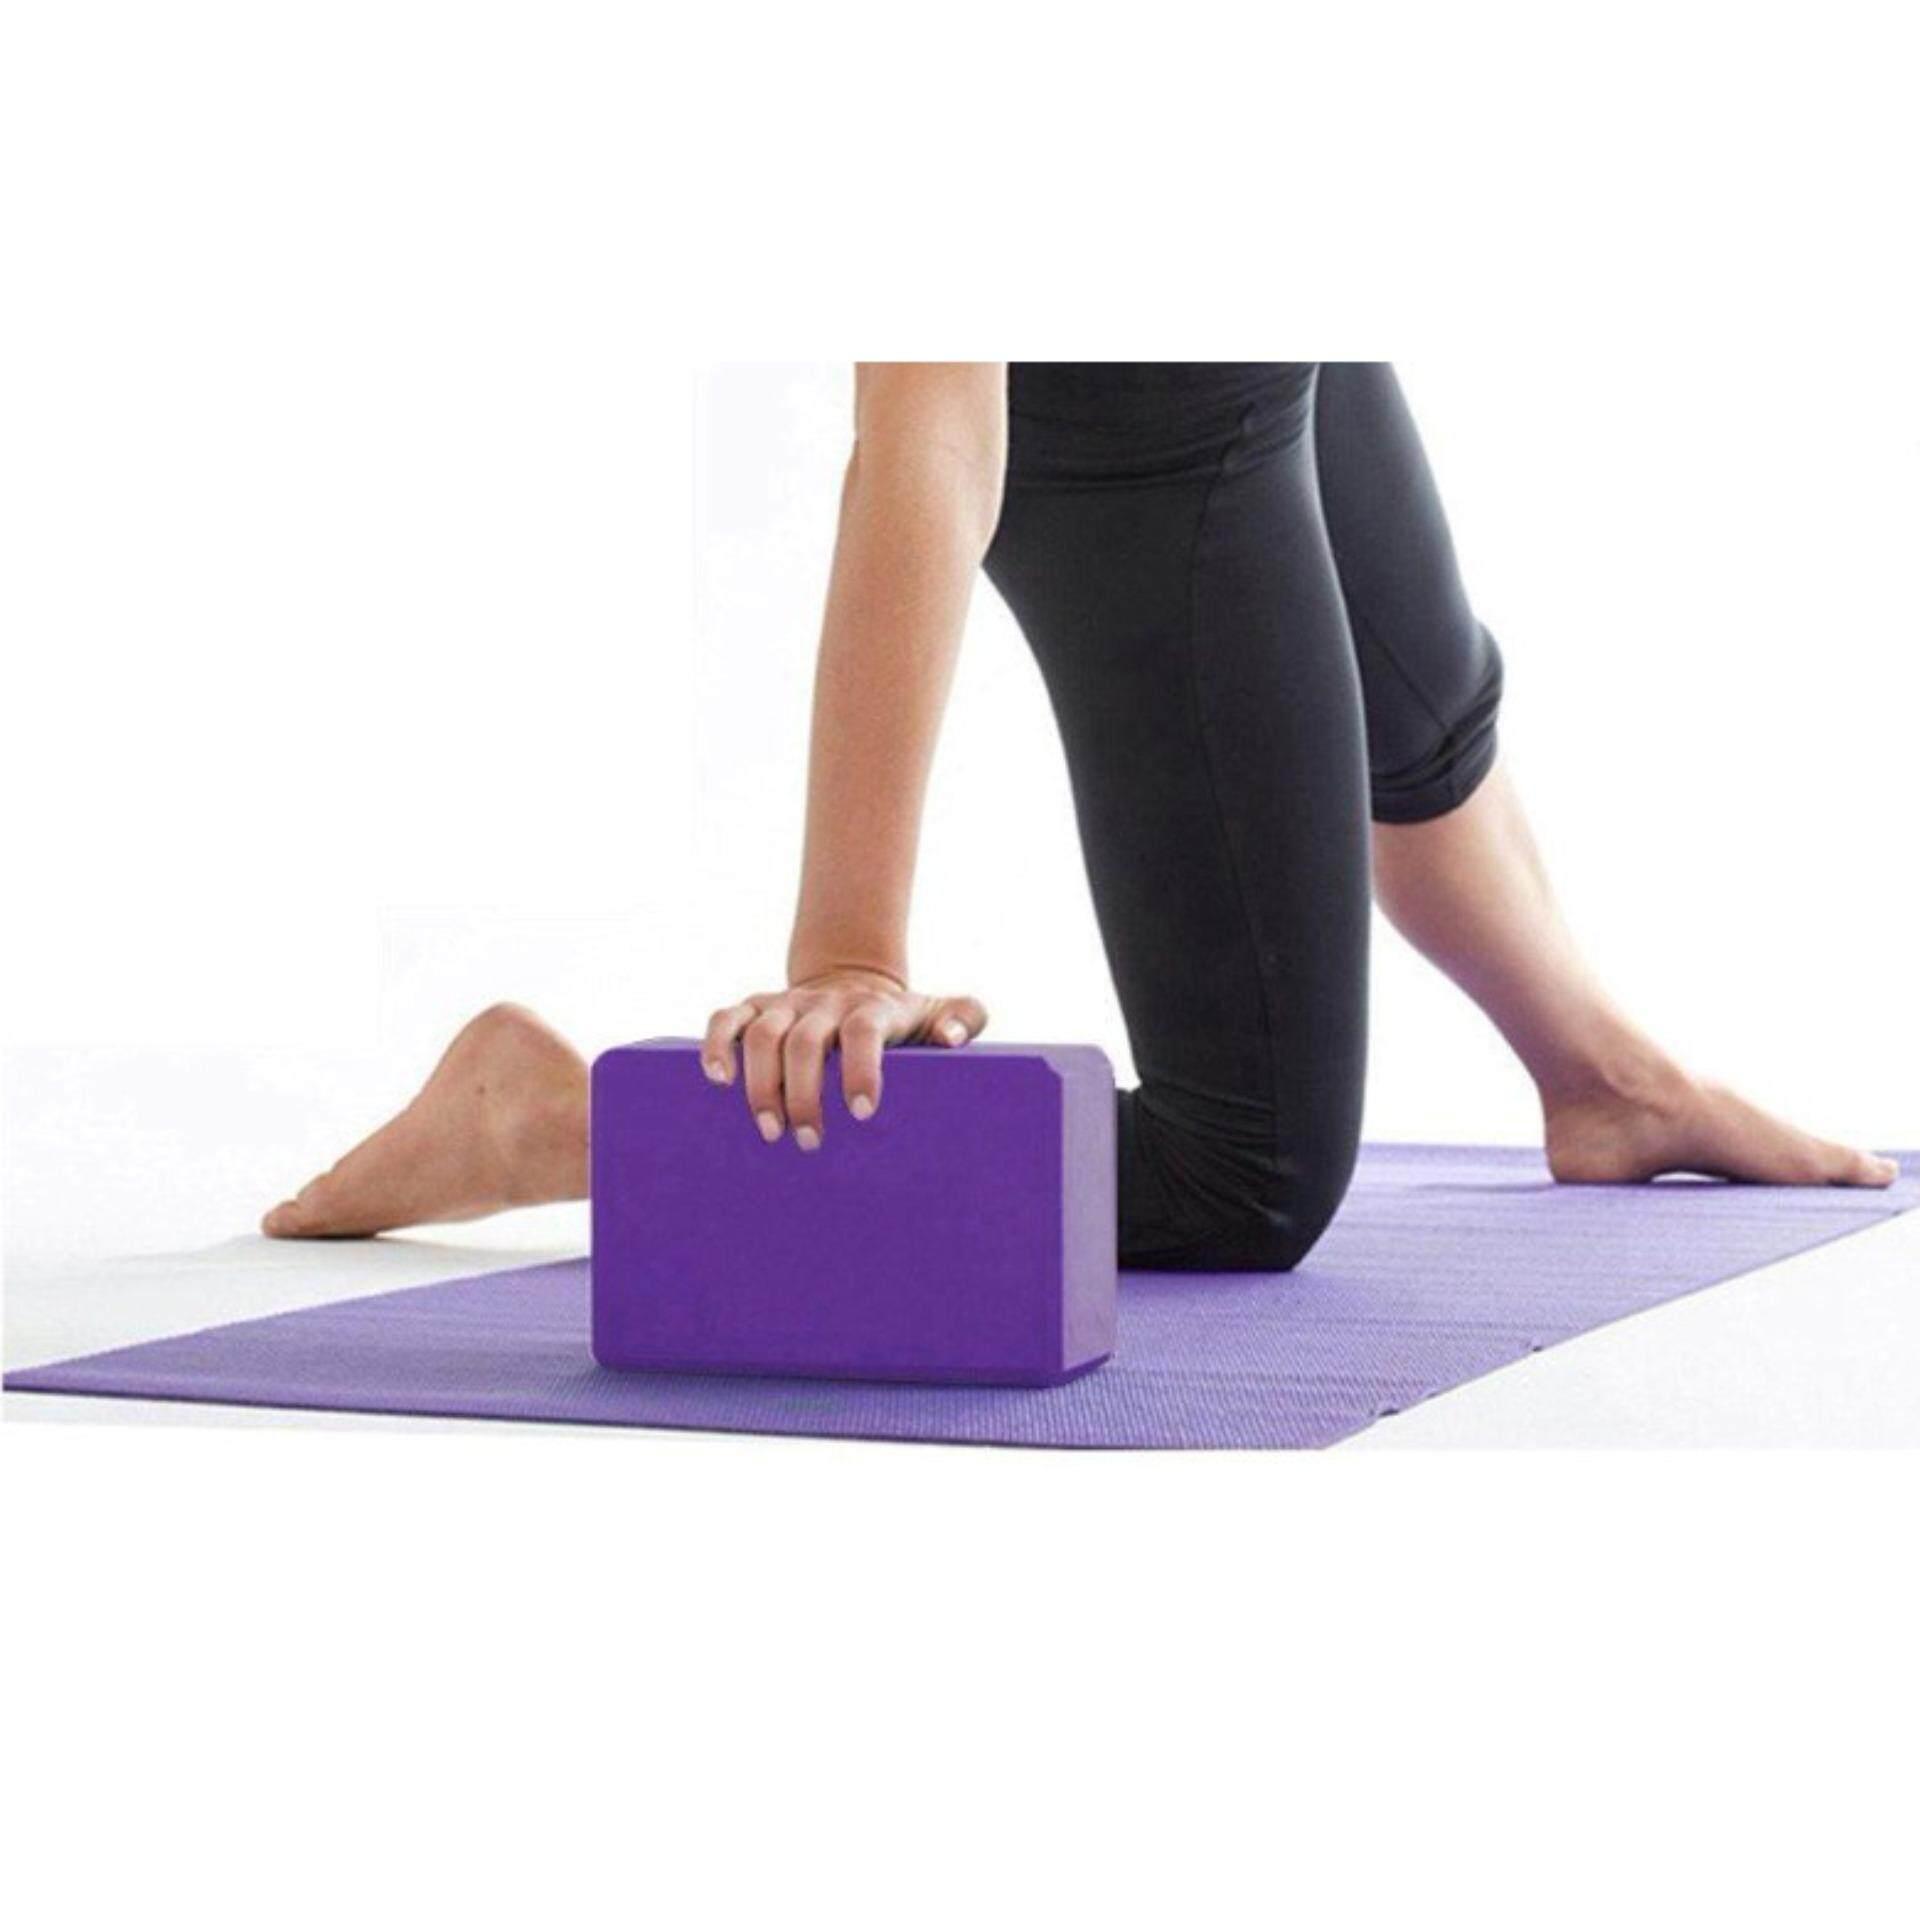 EVA Yoga Block Brick Foaming Foam Home Exercise Fitness Health (Purple)